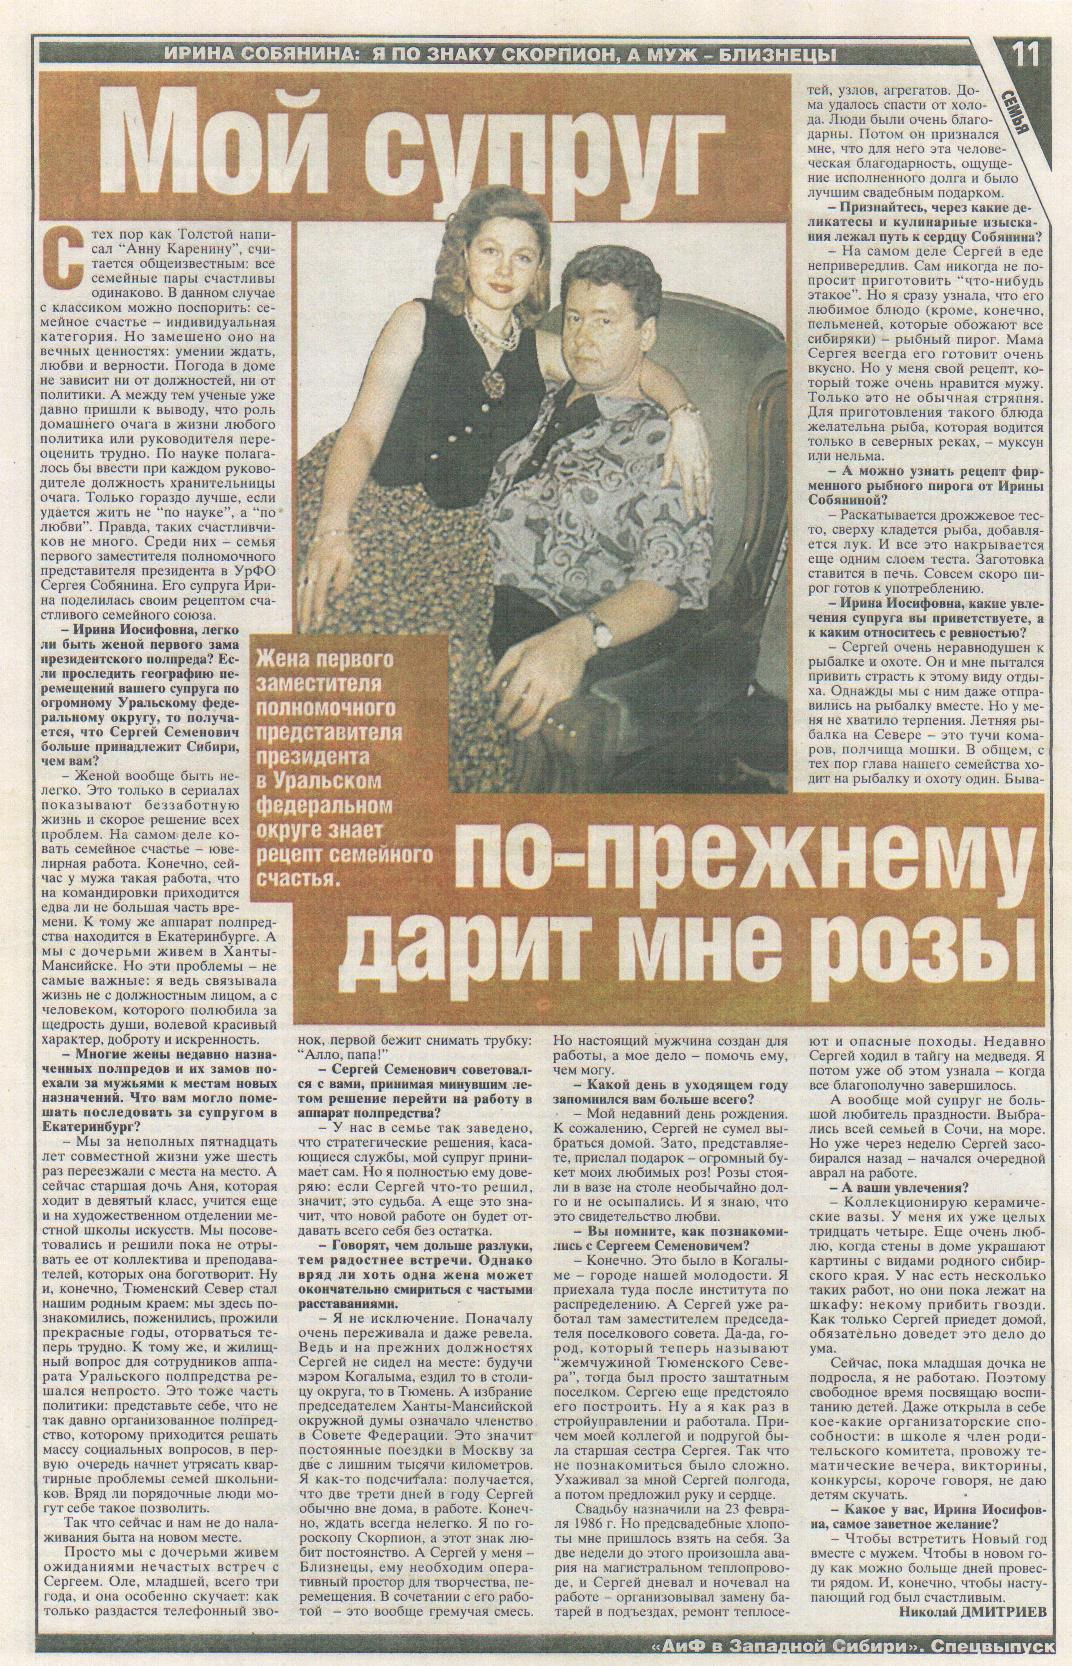 Собянин Рубинчик Ракова любовница измена развод скандал